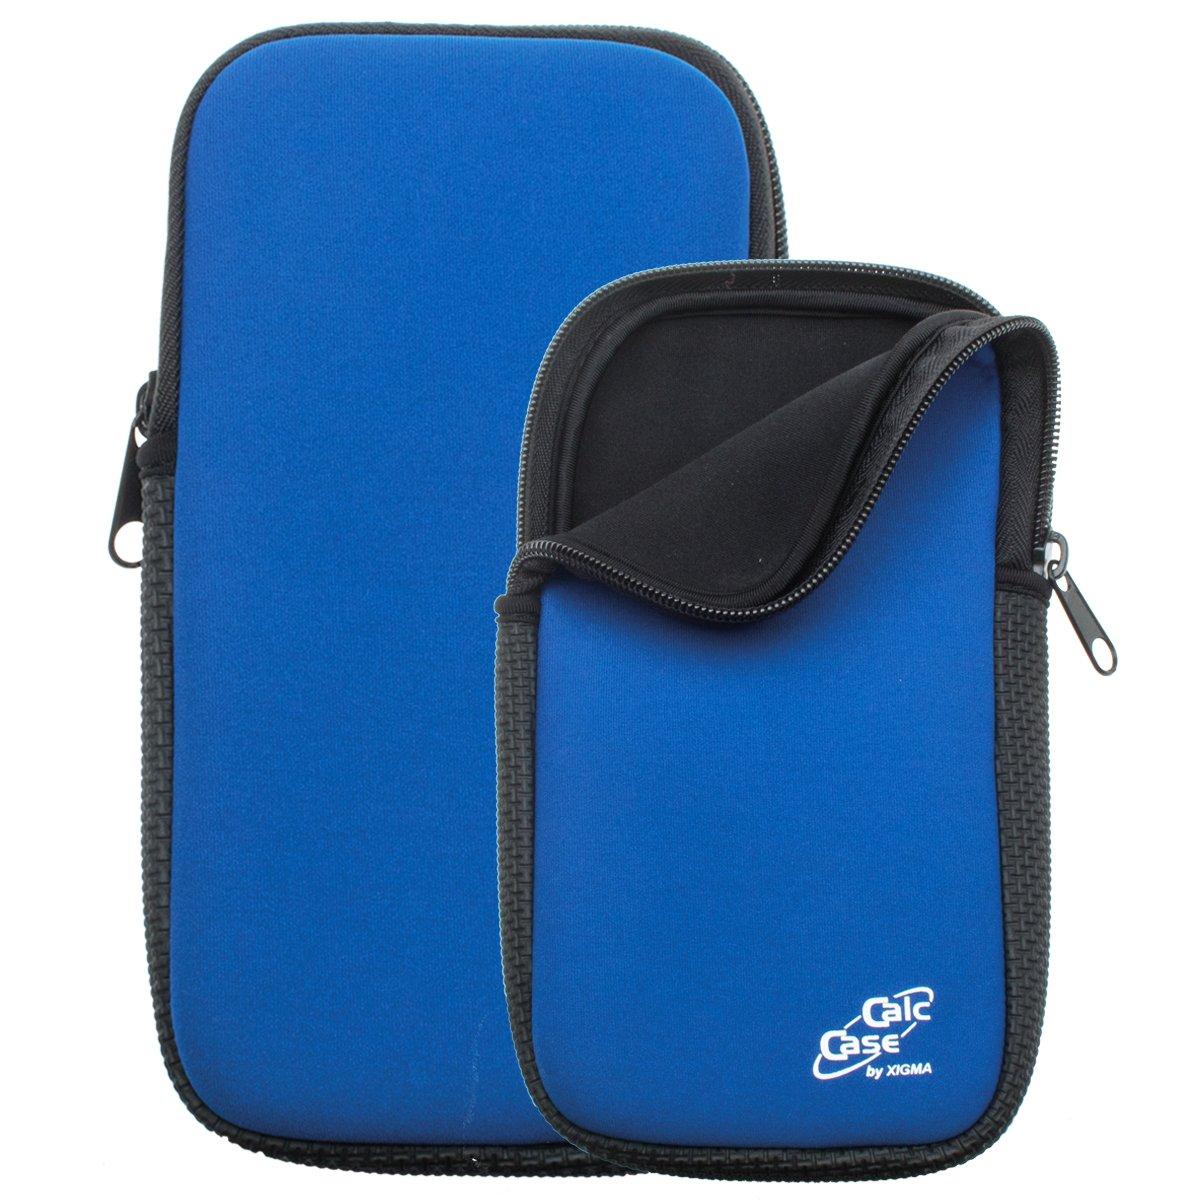 Protezione Borsa per calcolatrice grafica (calccase), blu (Blu) - CC SOFTY BLUE